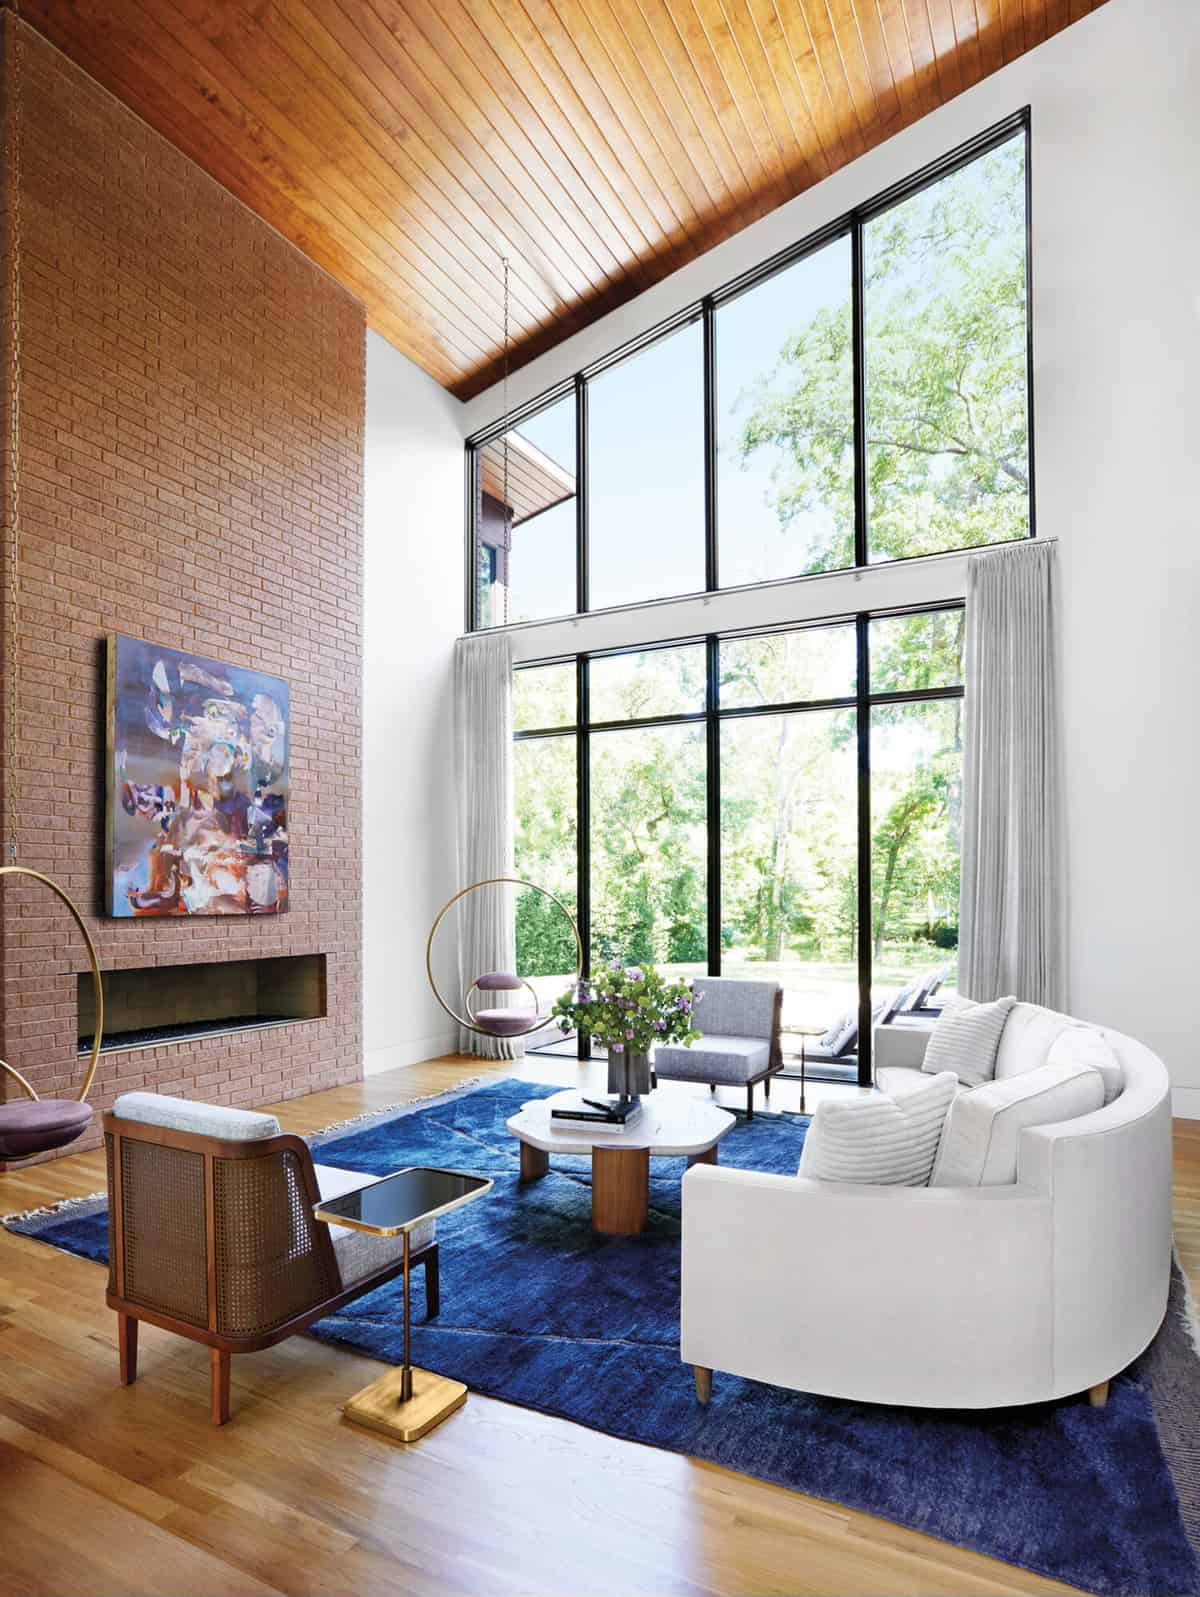 moderna-dnevna soba sredinom stoljeća